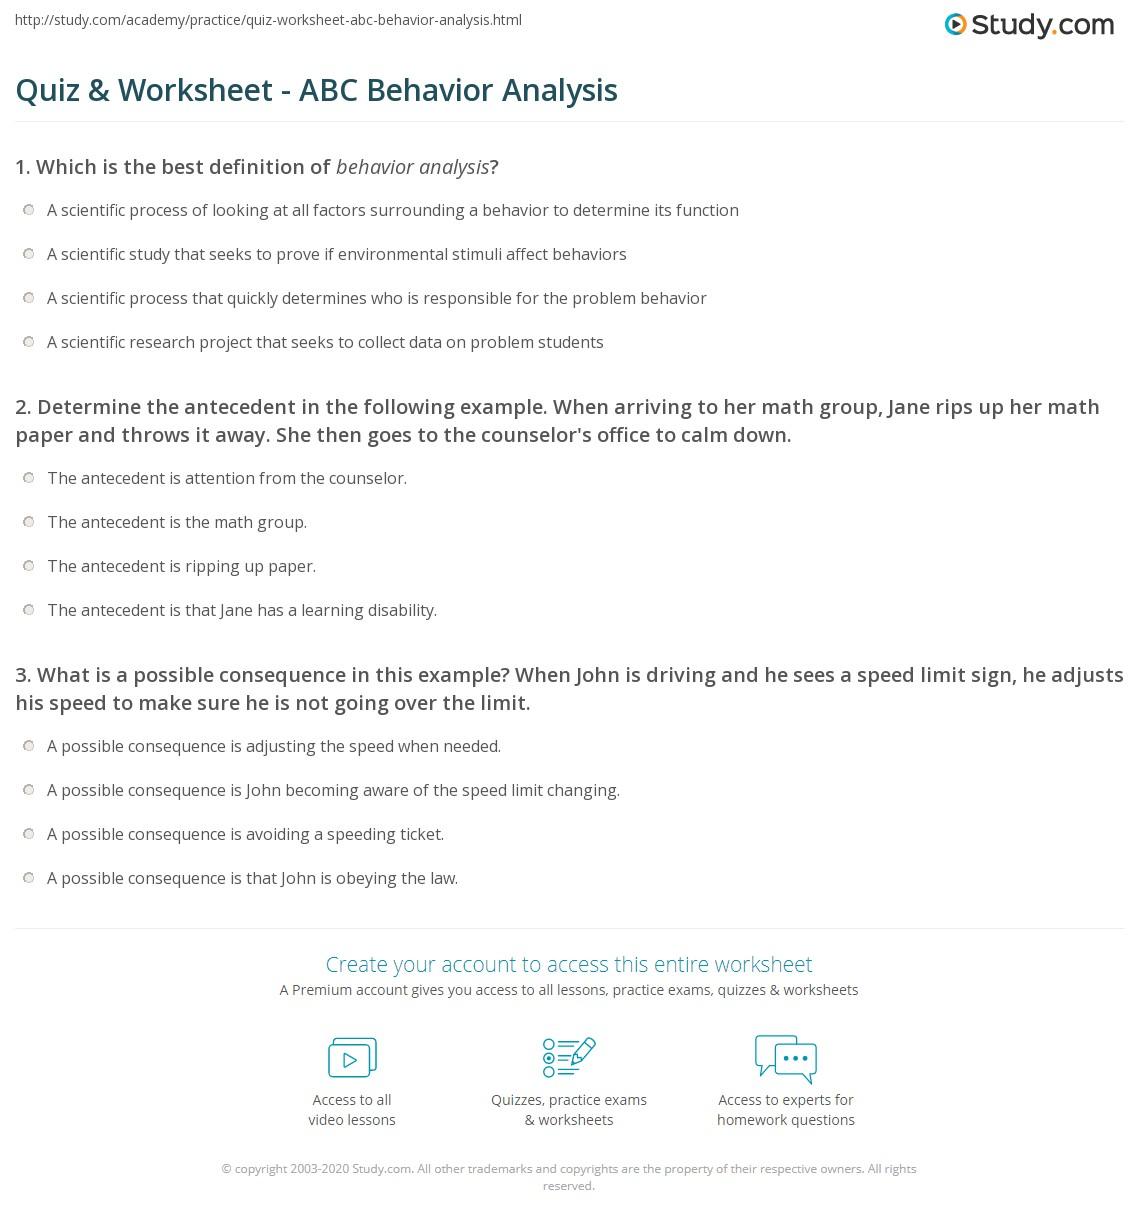 Quiz & Worksheet - ABC Behavior Analysis | Study.com